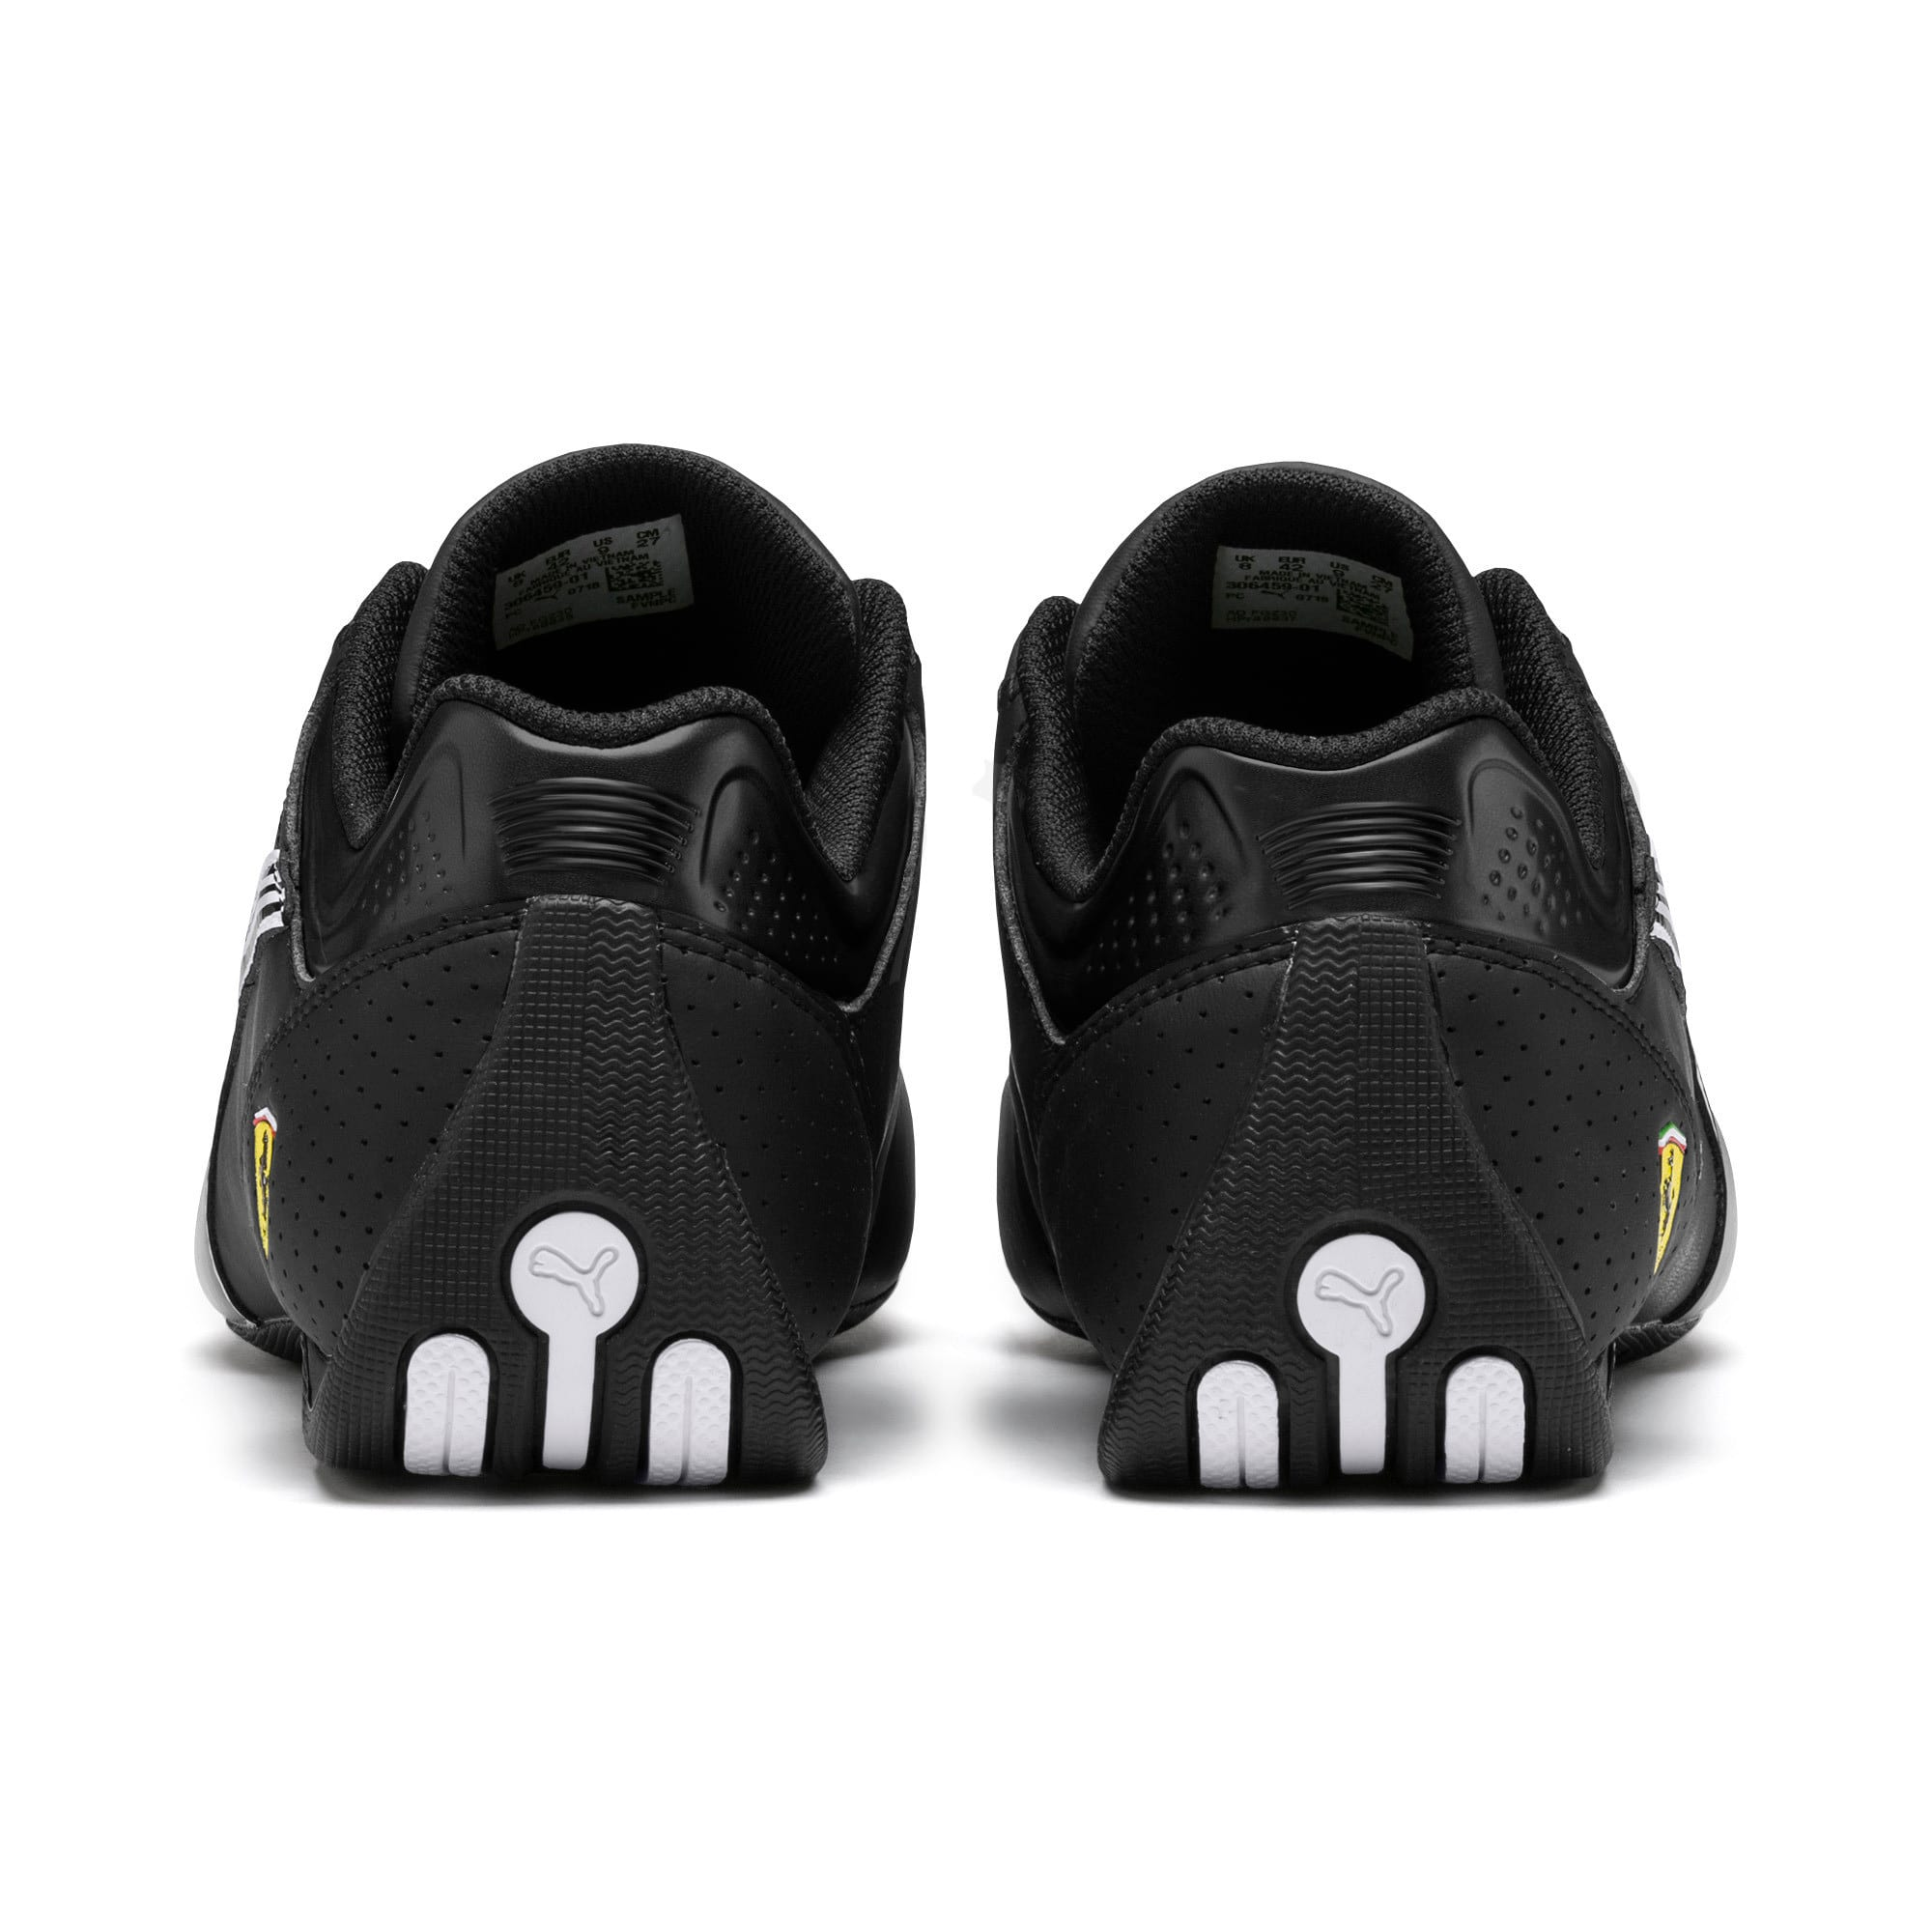 Thumbnail 4 of Scuderia Ferrari Future Kart Cat Shoes, Black-Puma White-Rosso Corsa, medium